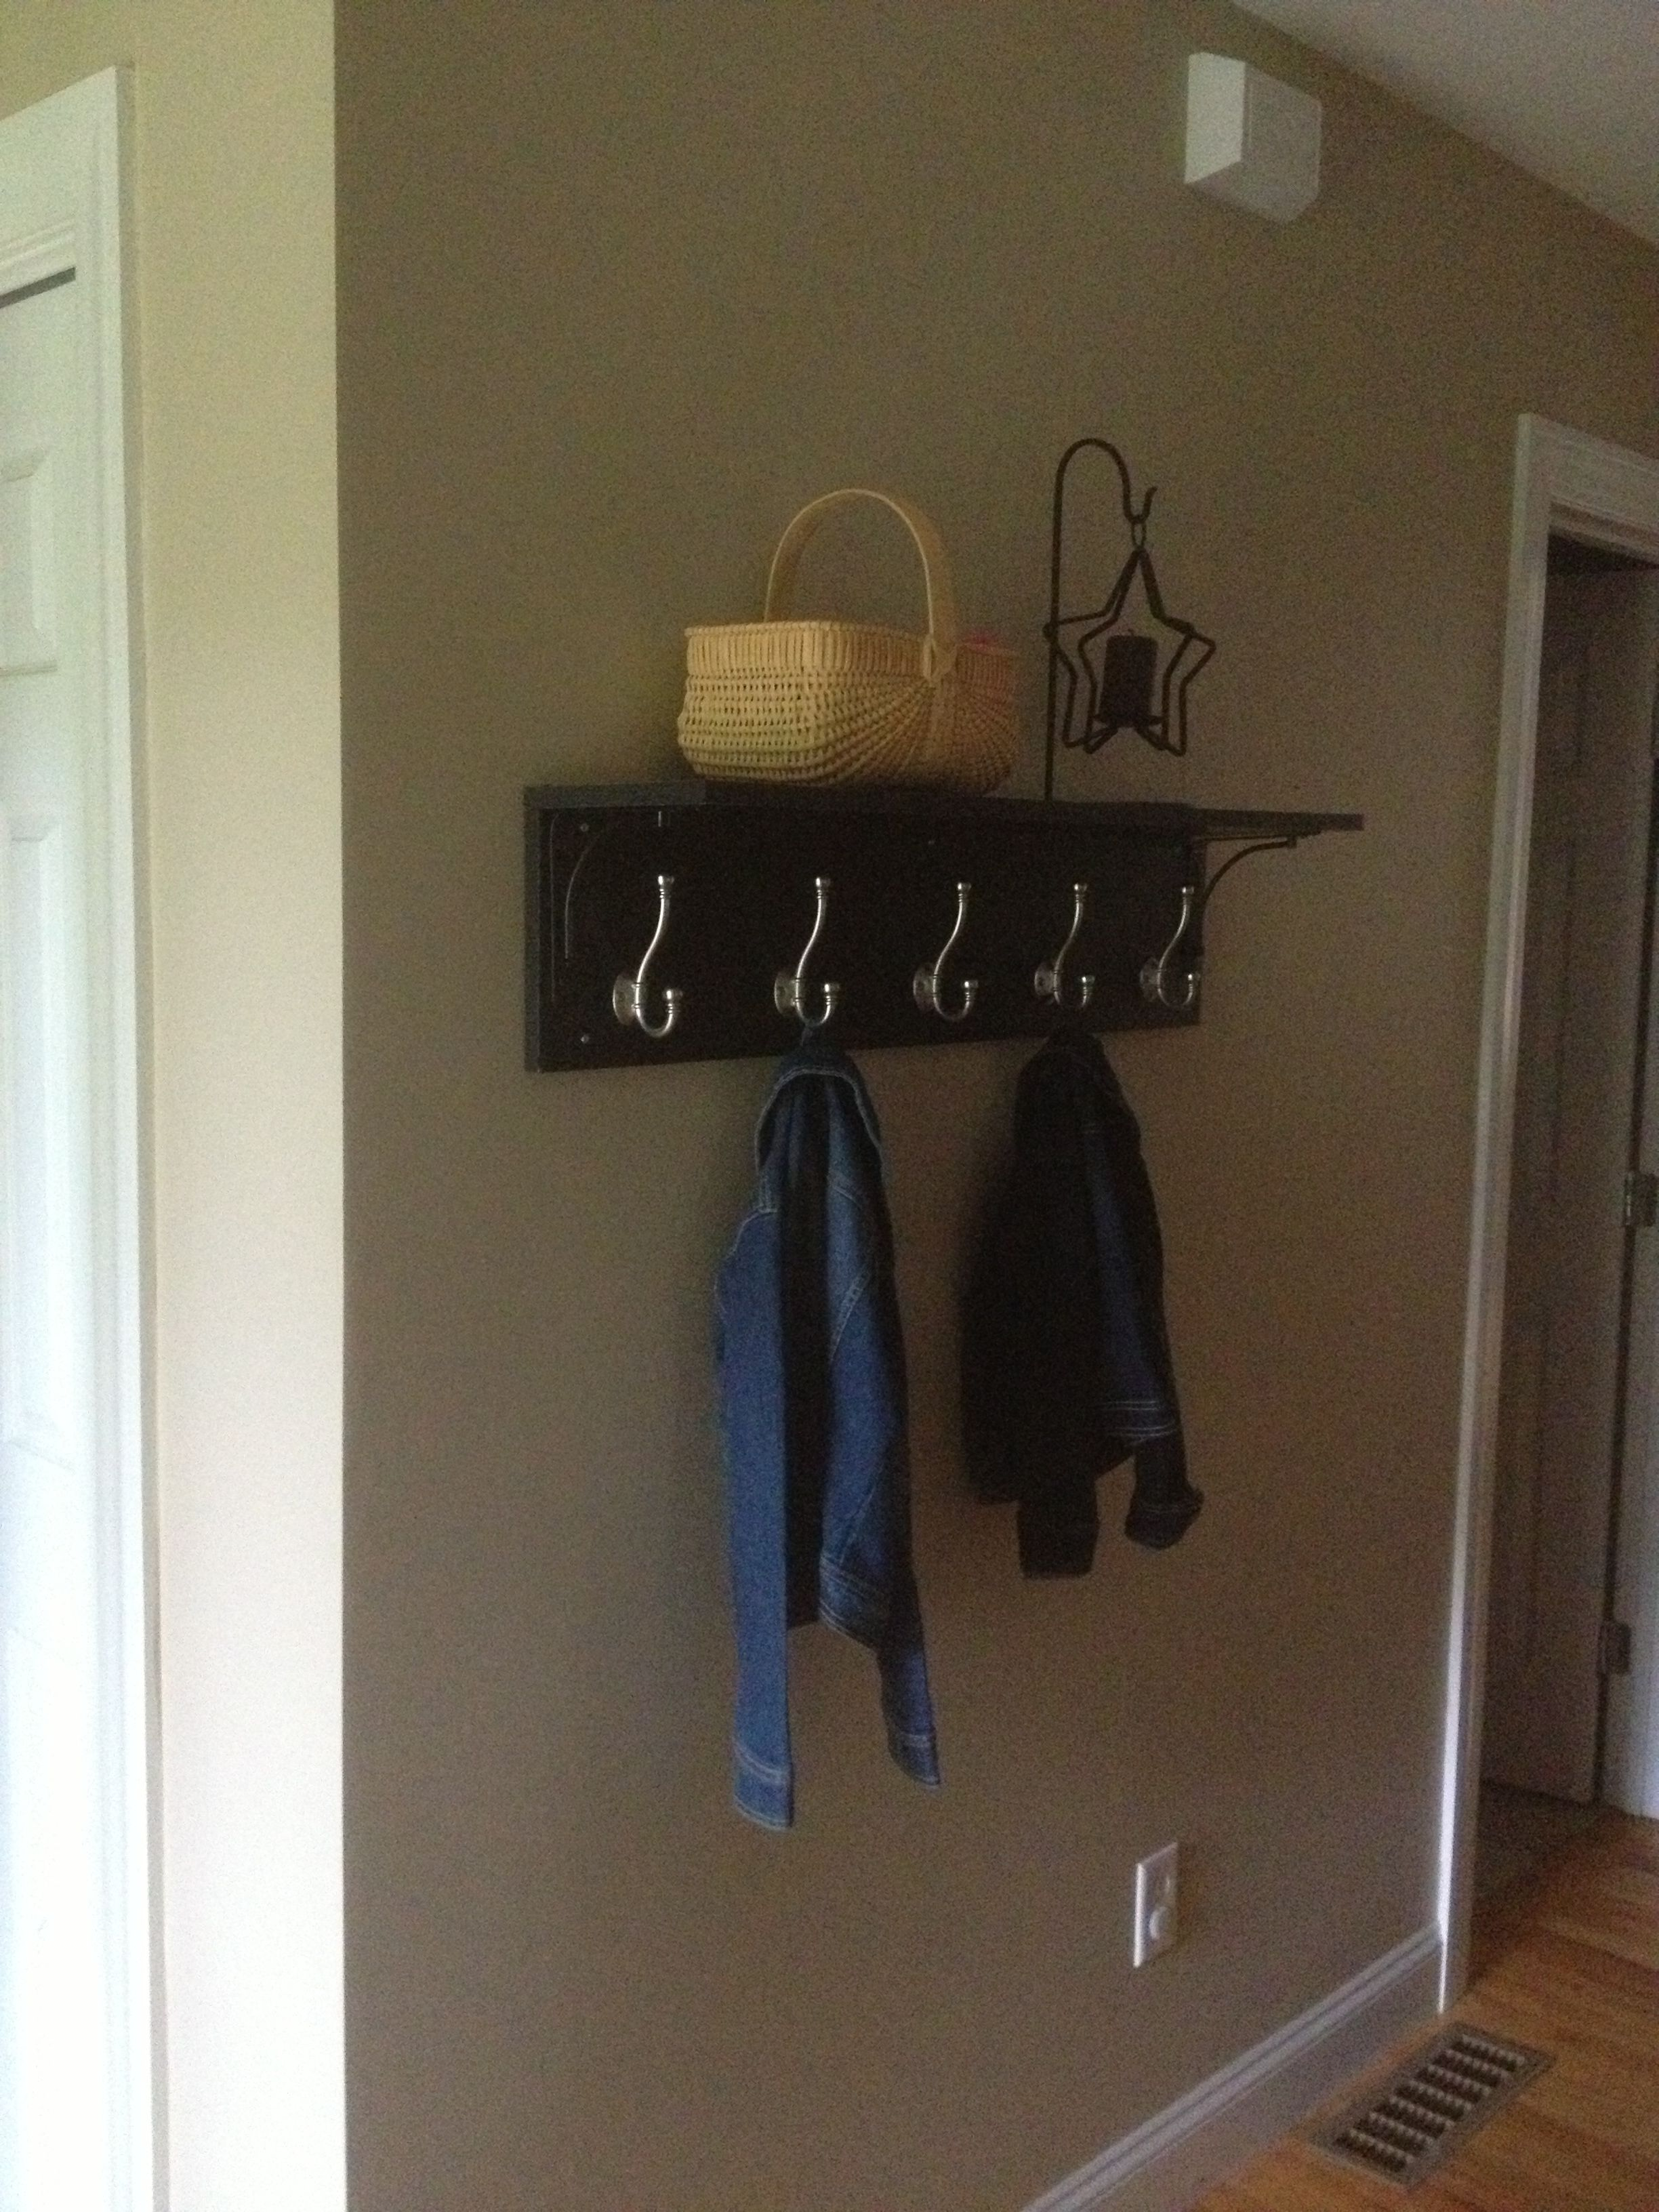 Diy Coat Rack Two Prefab Laminate Shelf Boards Two Shelf Brackets And Decorative Hooks Screw One Board Flat A Diy Coat Rack Diy House Projects Diy Furniture